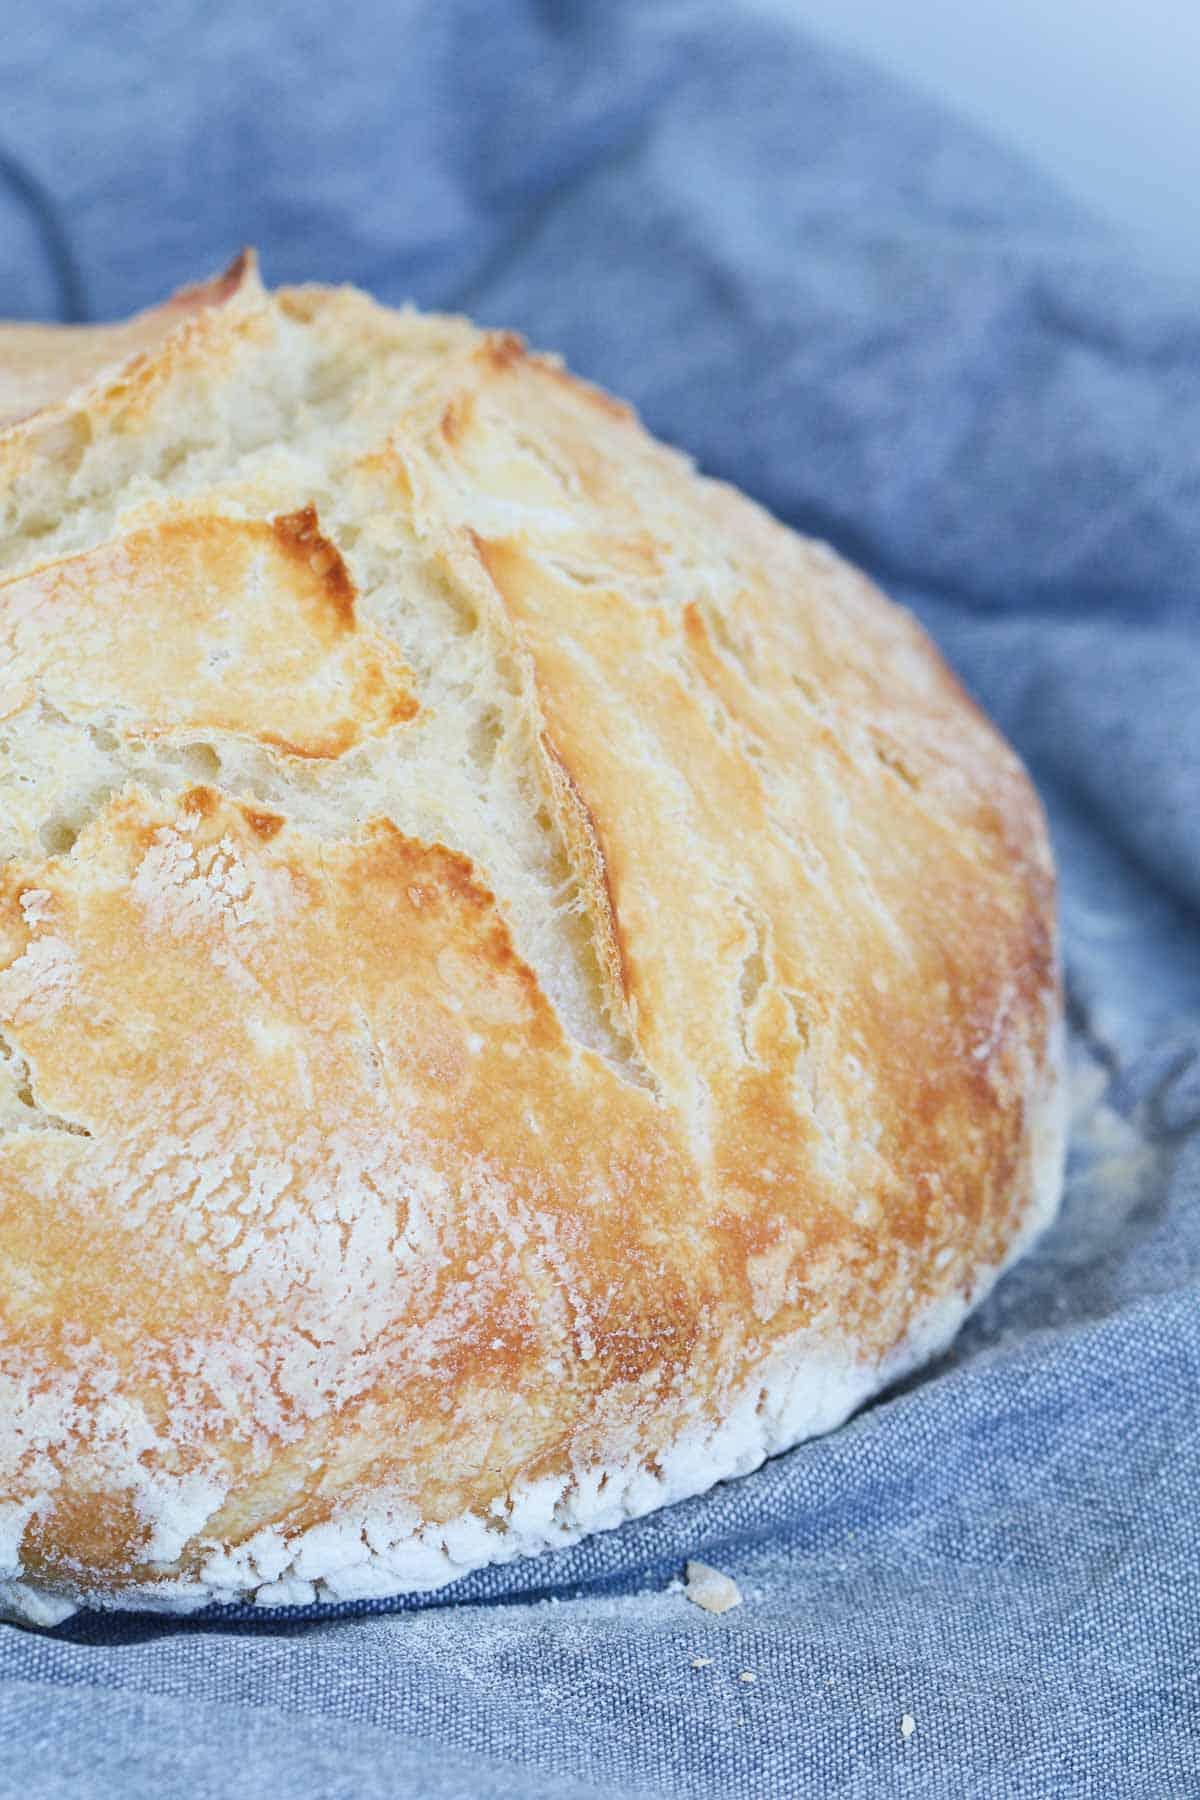 A loaf of sourdough.